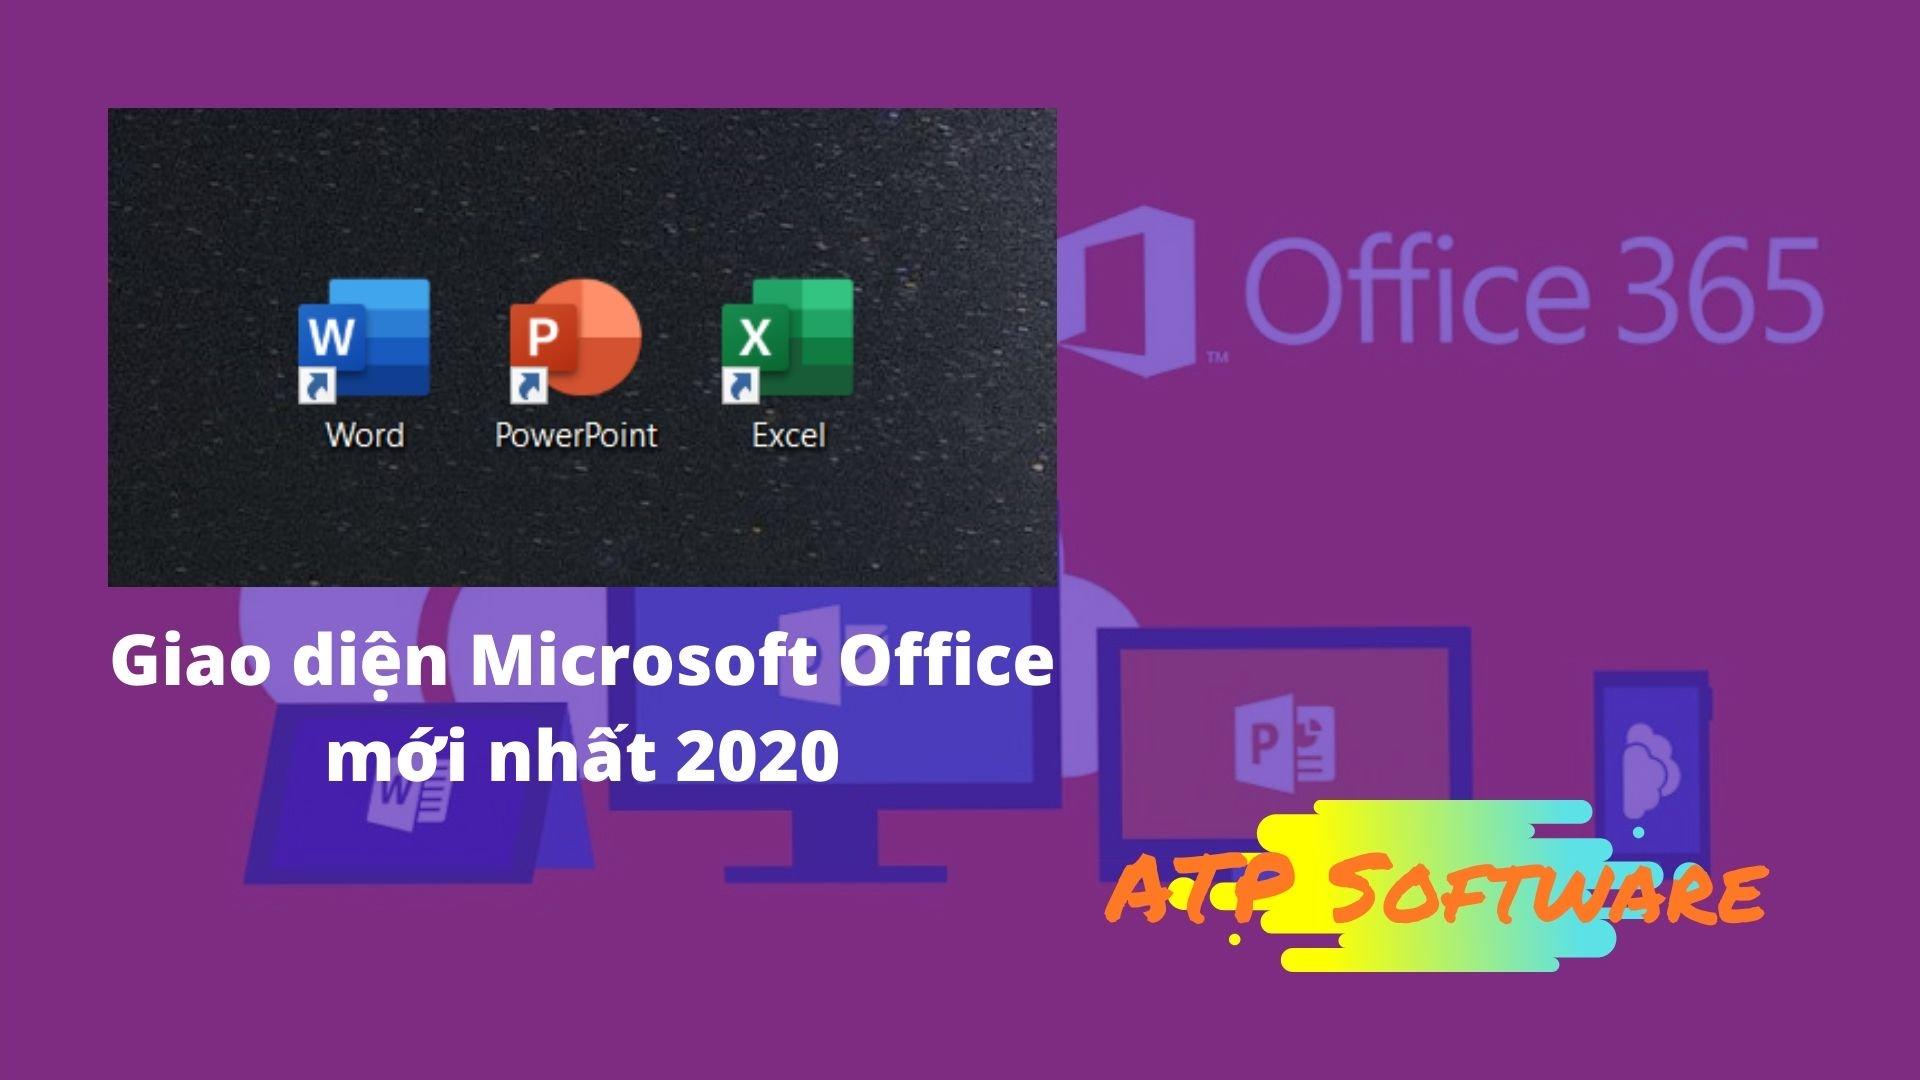 Giao diện Microsoft Office mới nhất 2020